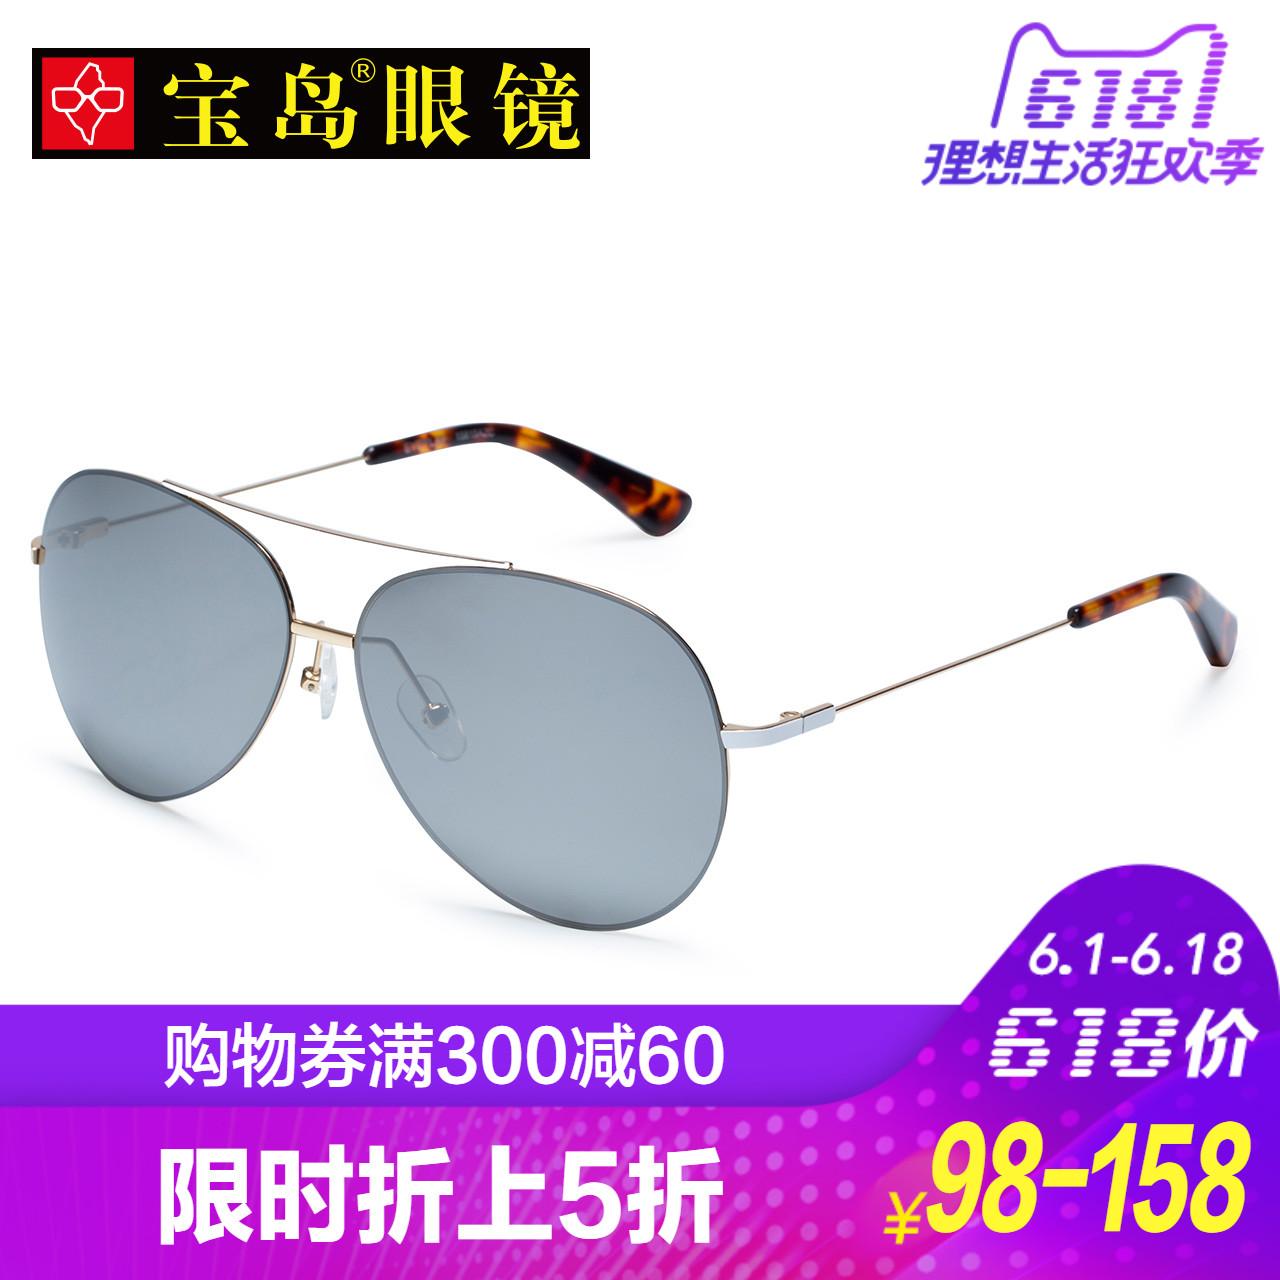 eyeplay 太阳眼镜怎么样,好不好